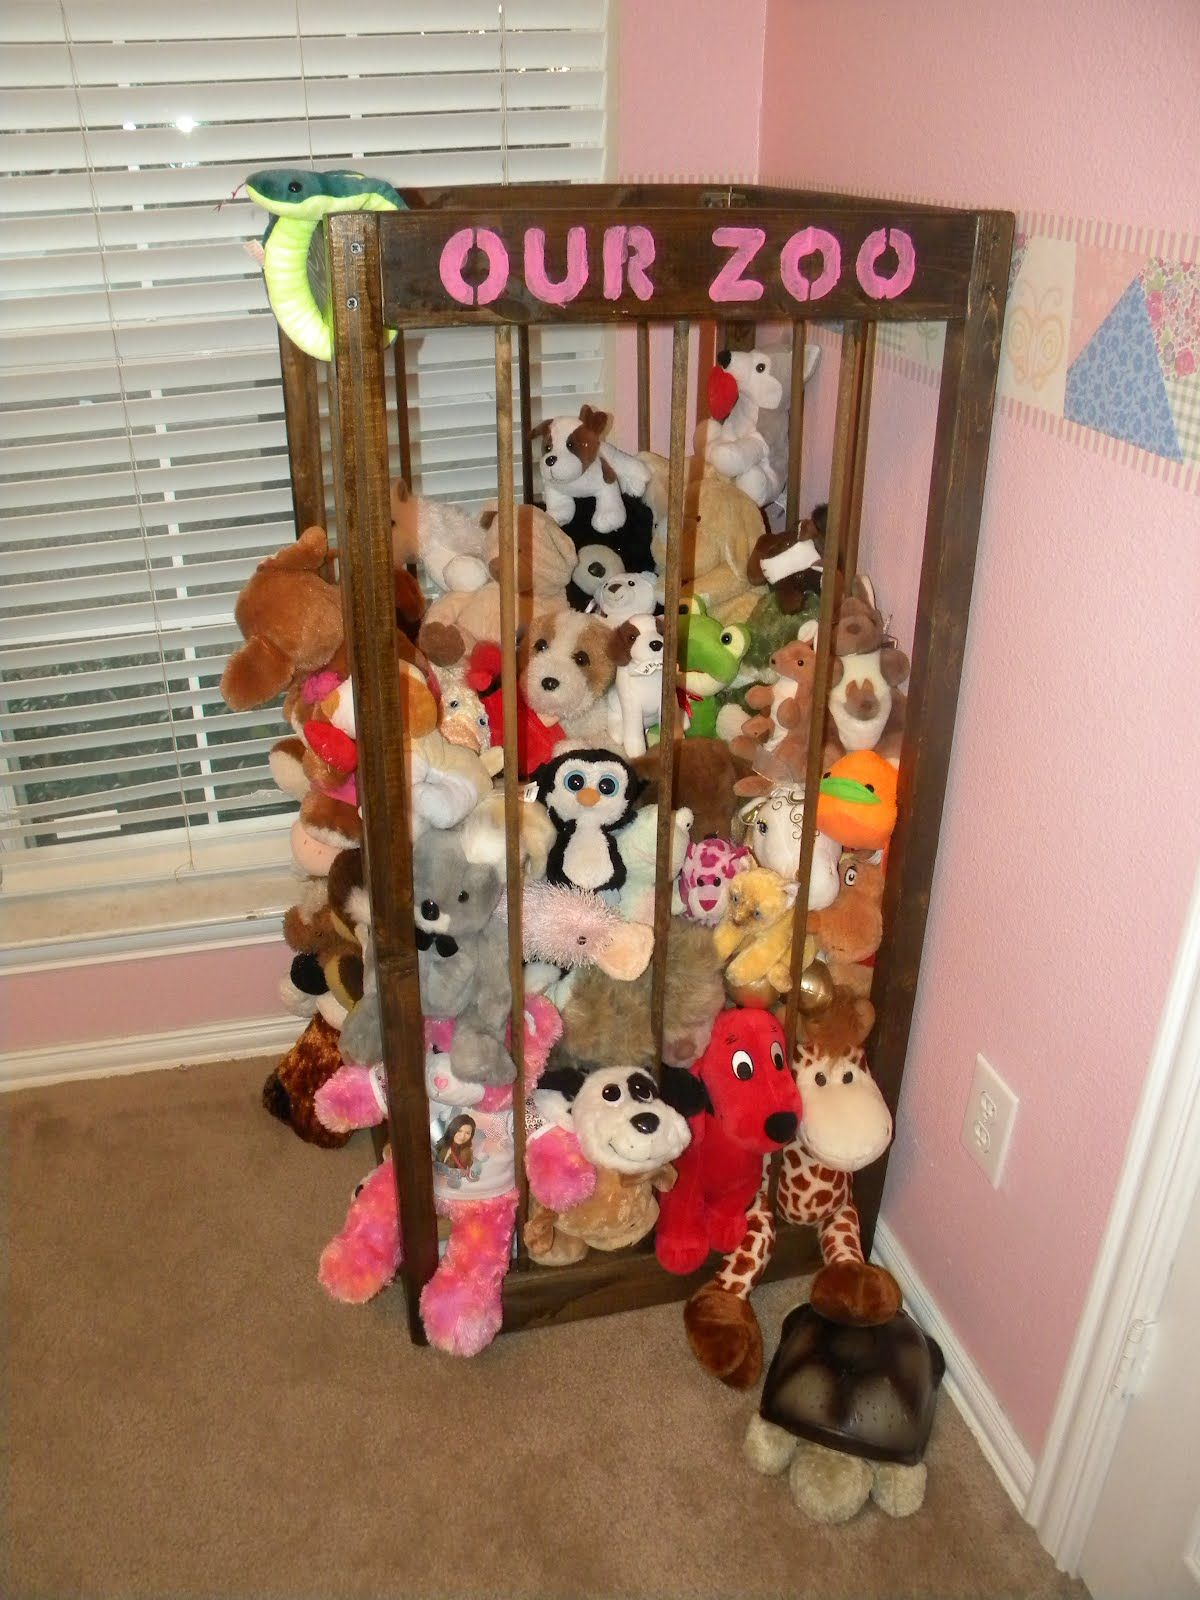 Zoo Great Idea For Stuffed Animal Storage Fun Things To